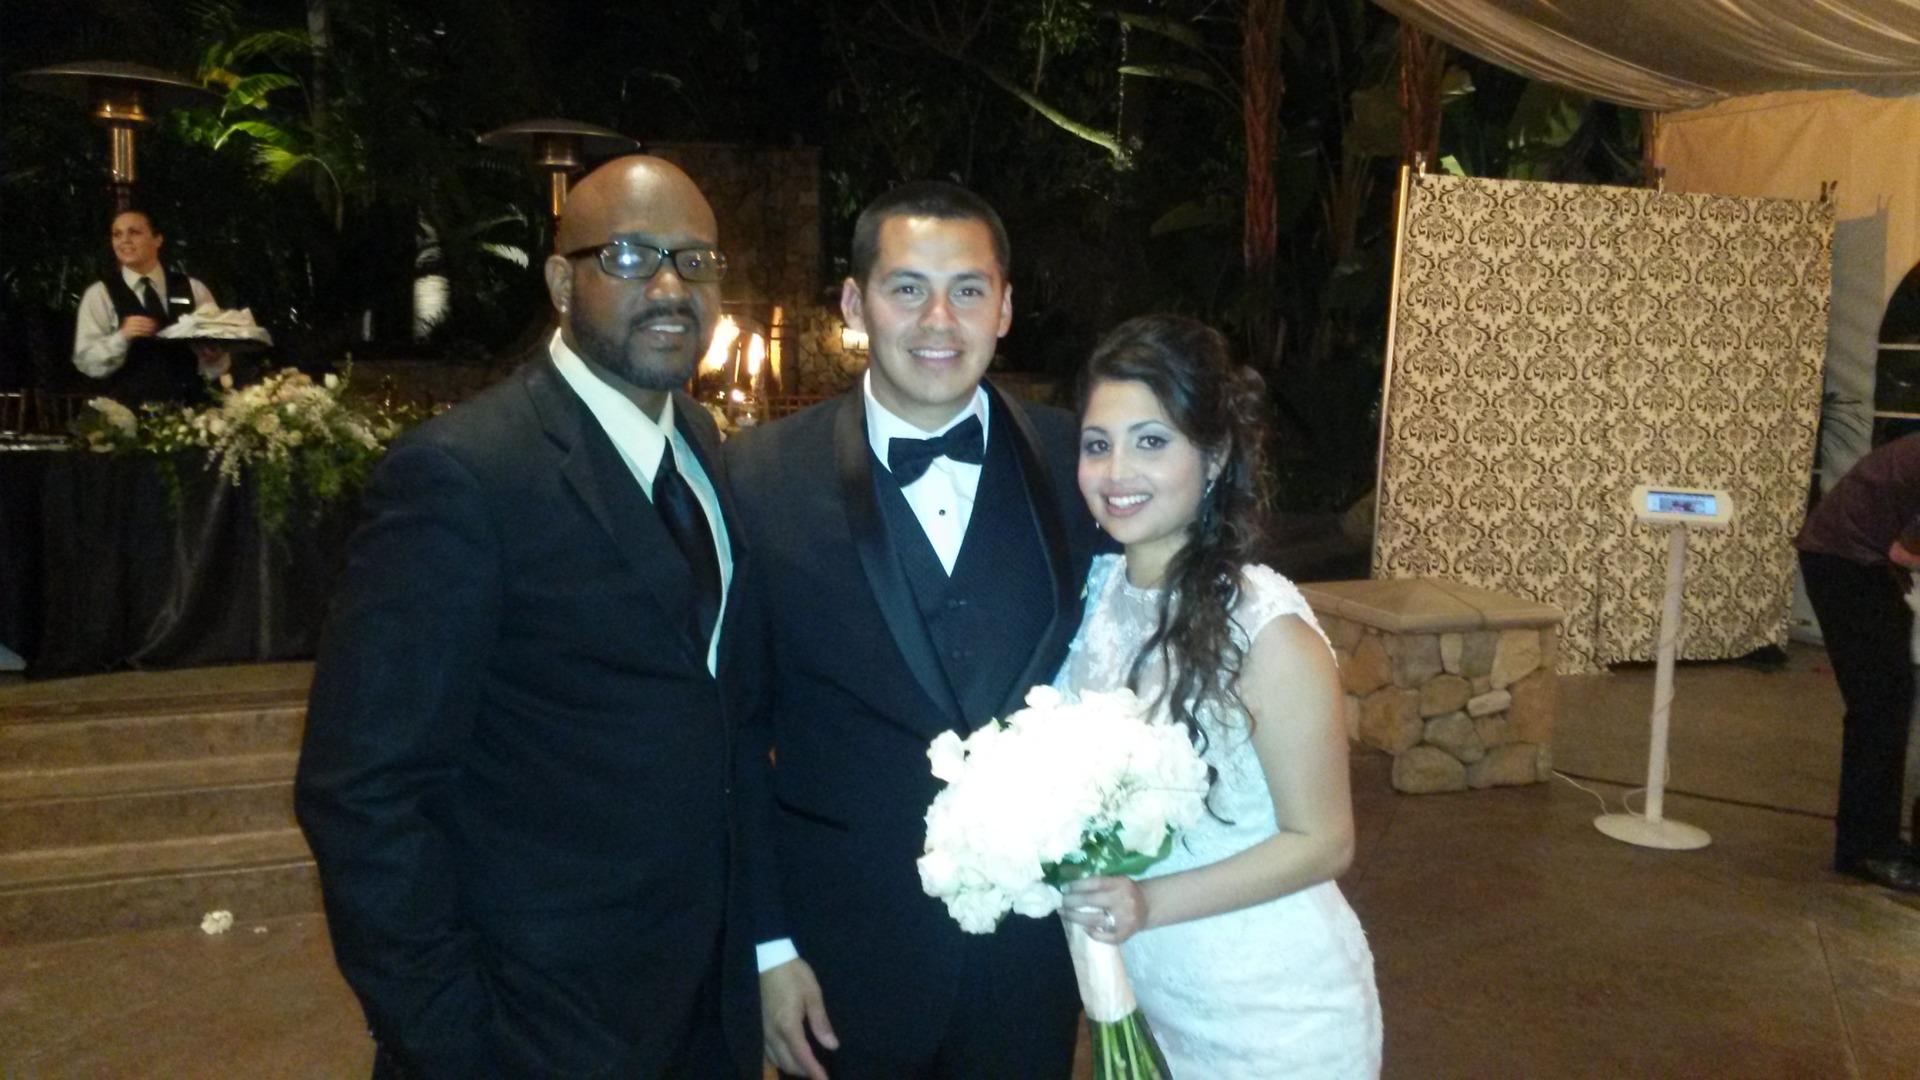 San Diego Wedding DJ Earl Henry with the very happy couple!